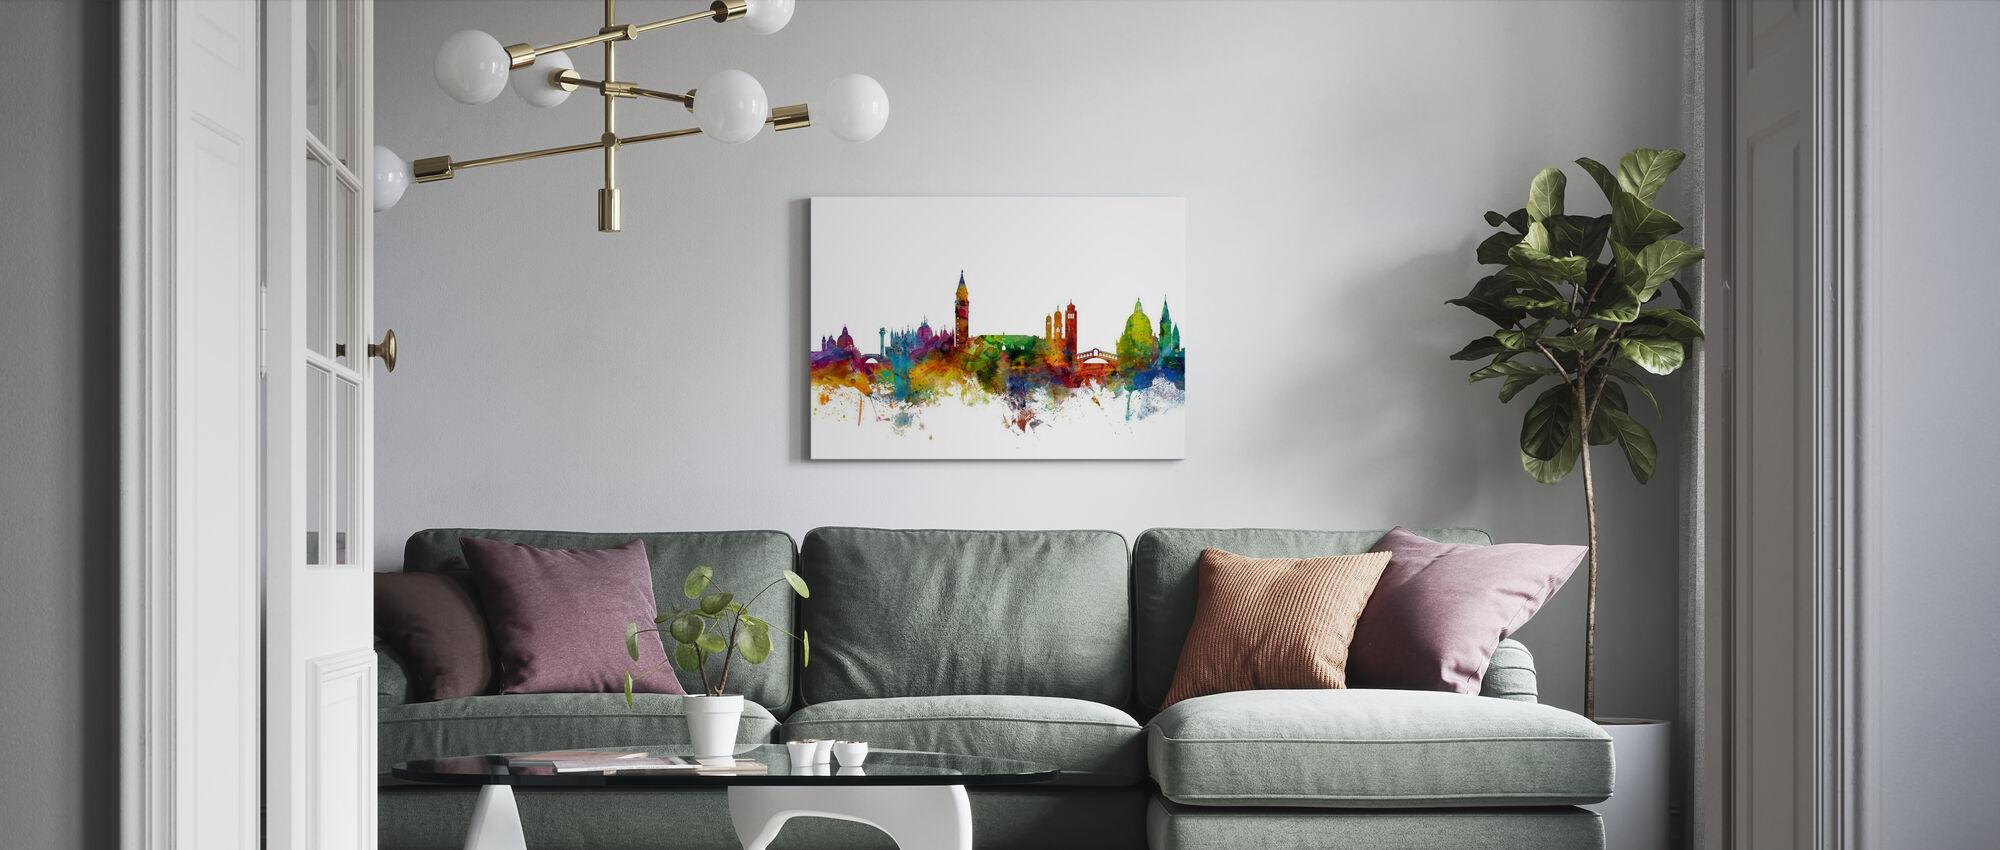 Venice Skyline - Canvas print - Living Room